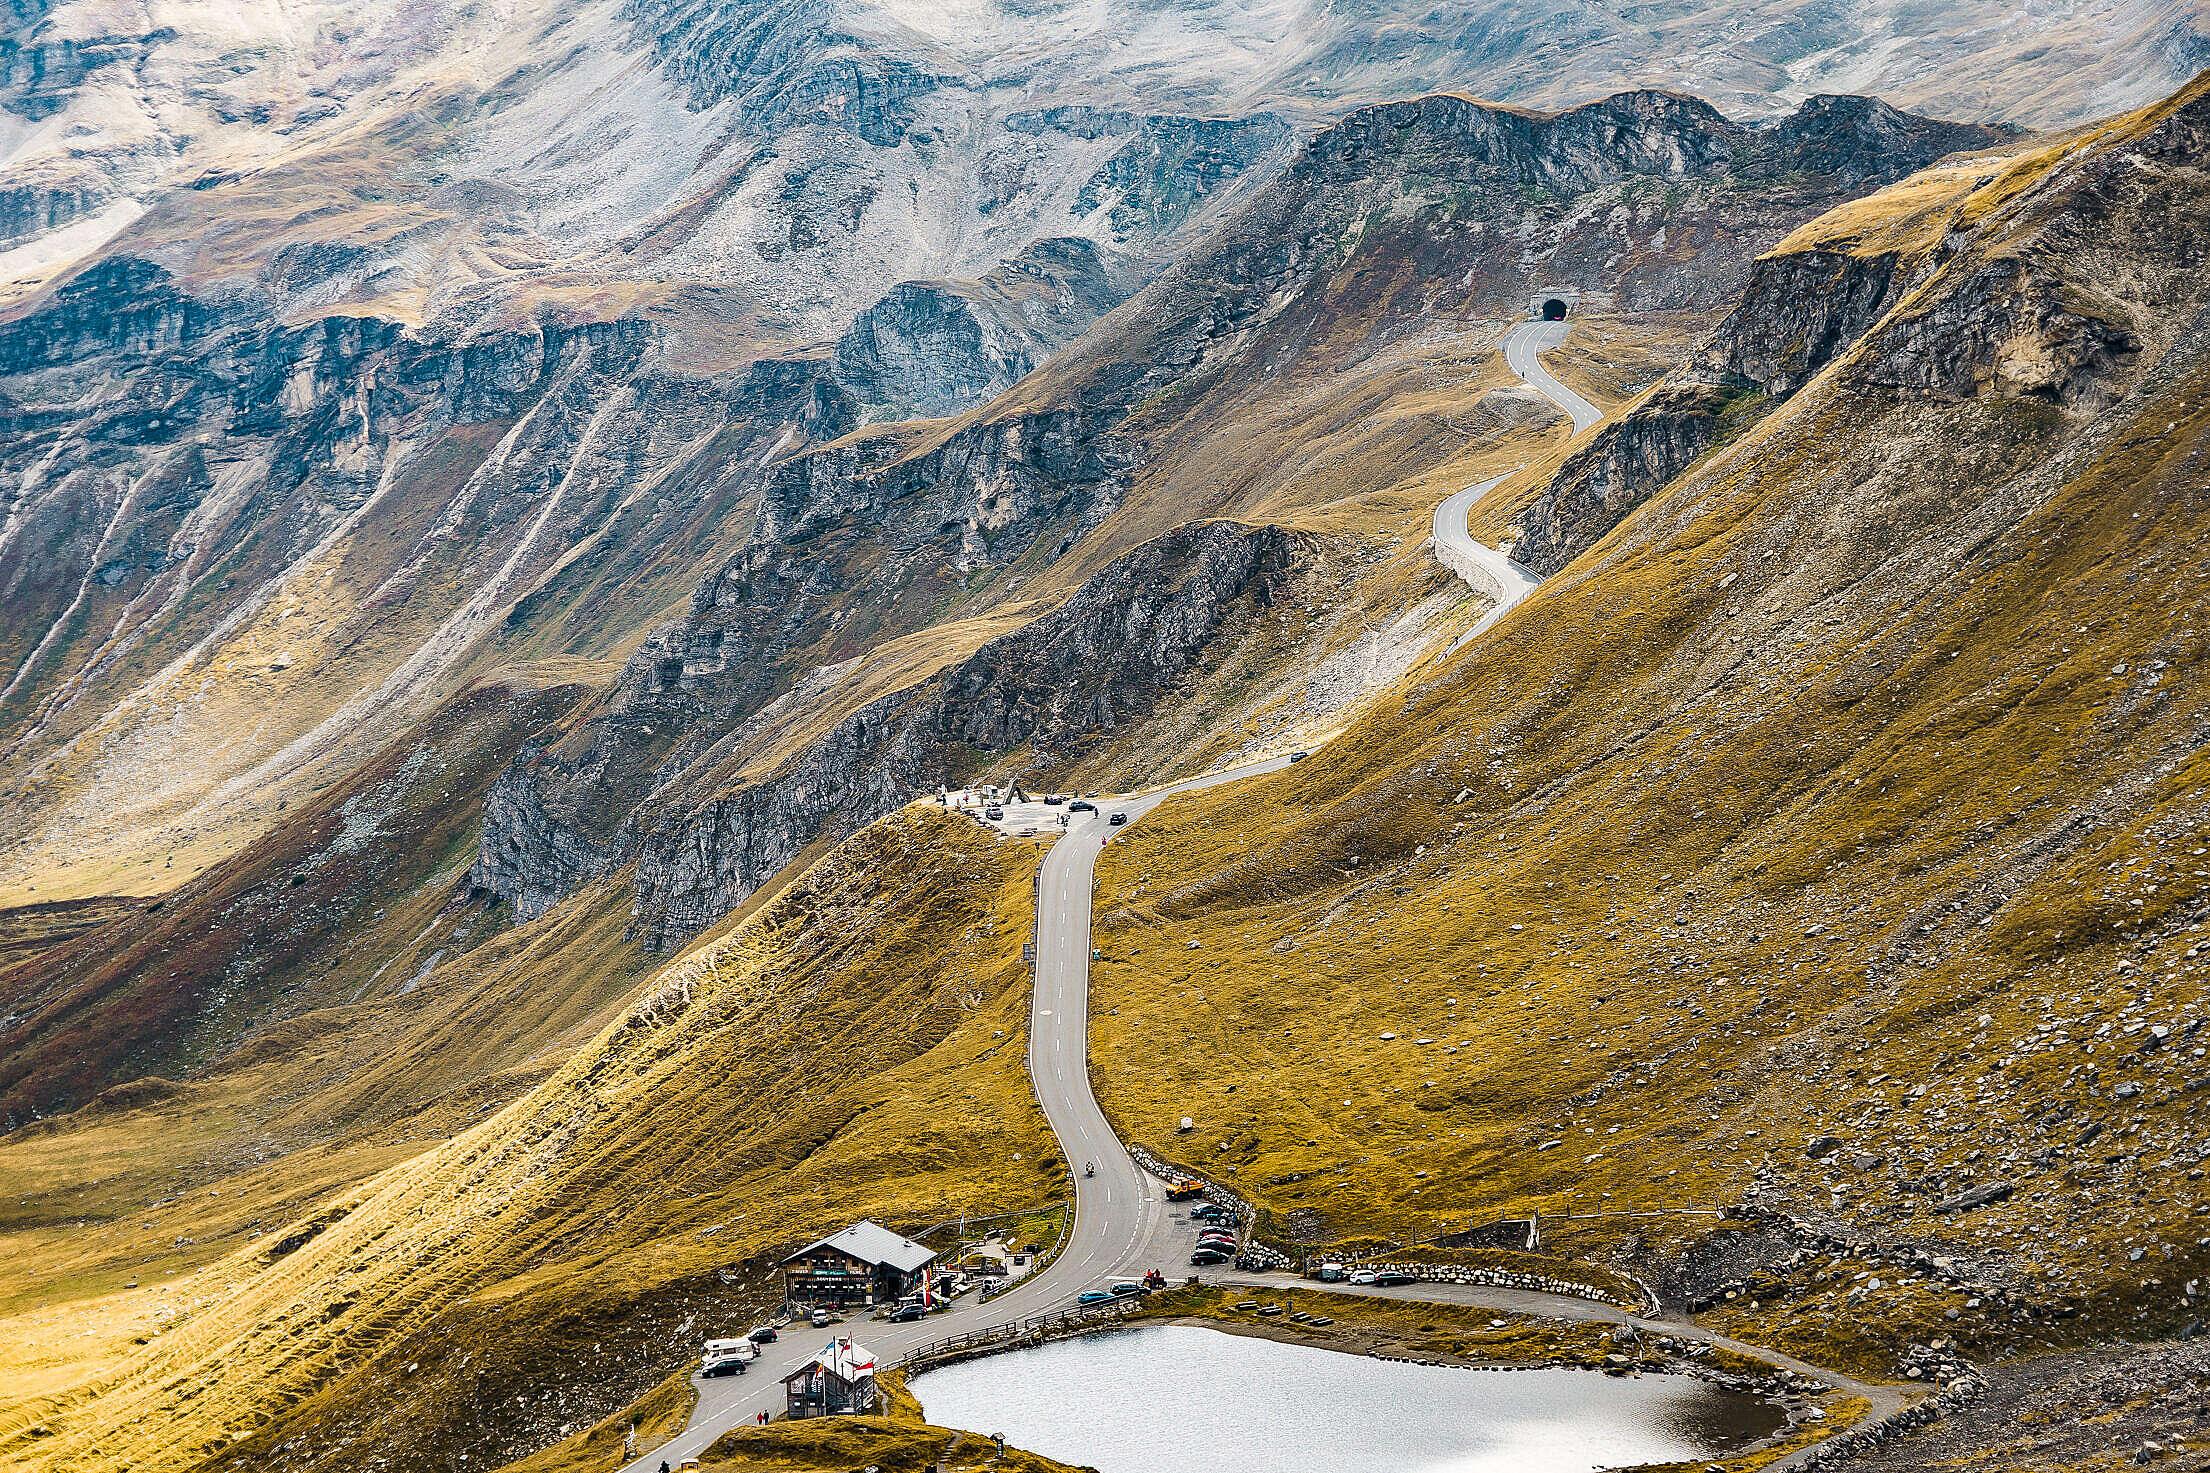 Grossglockner Mountain Road Alpine Pass Tunnel Free Stock Photo